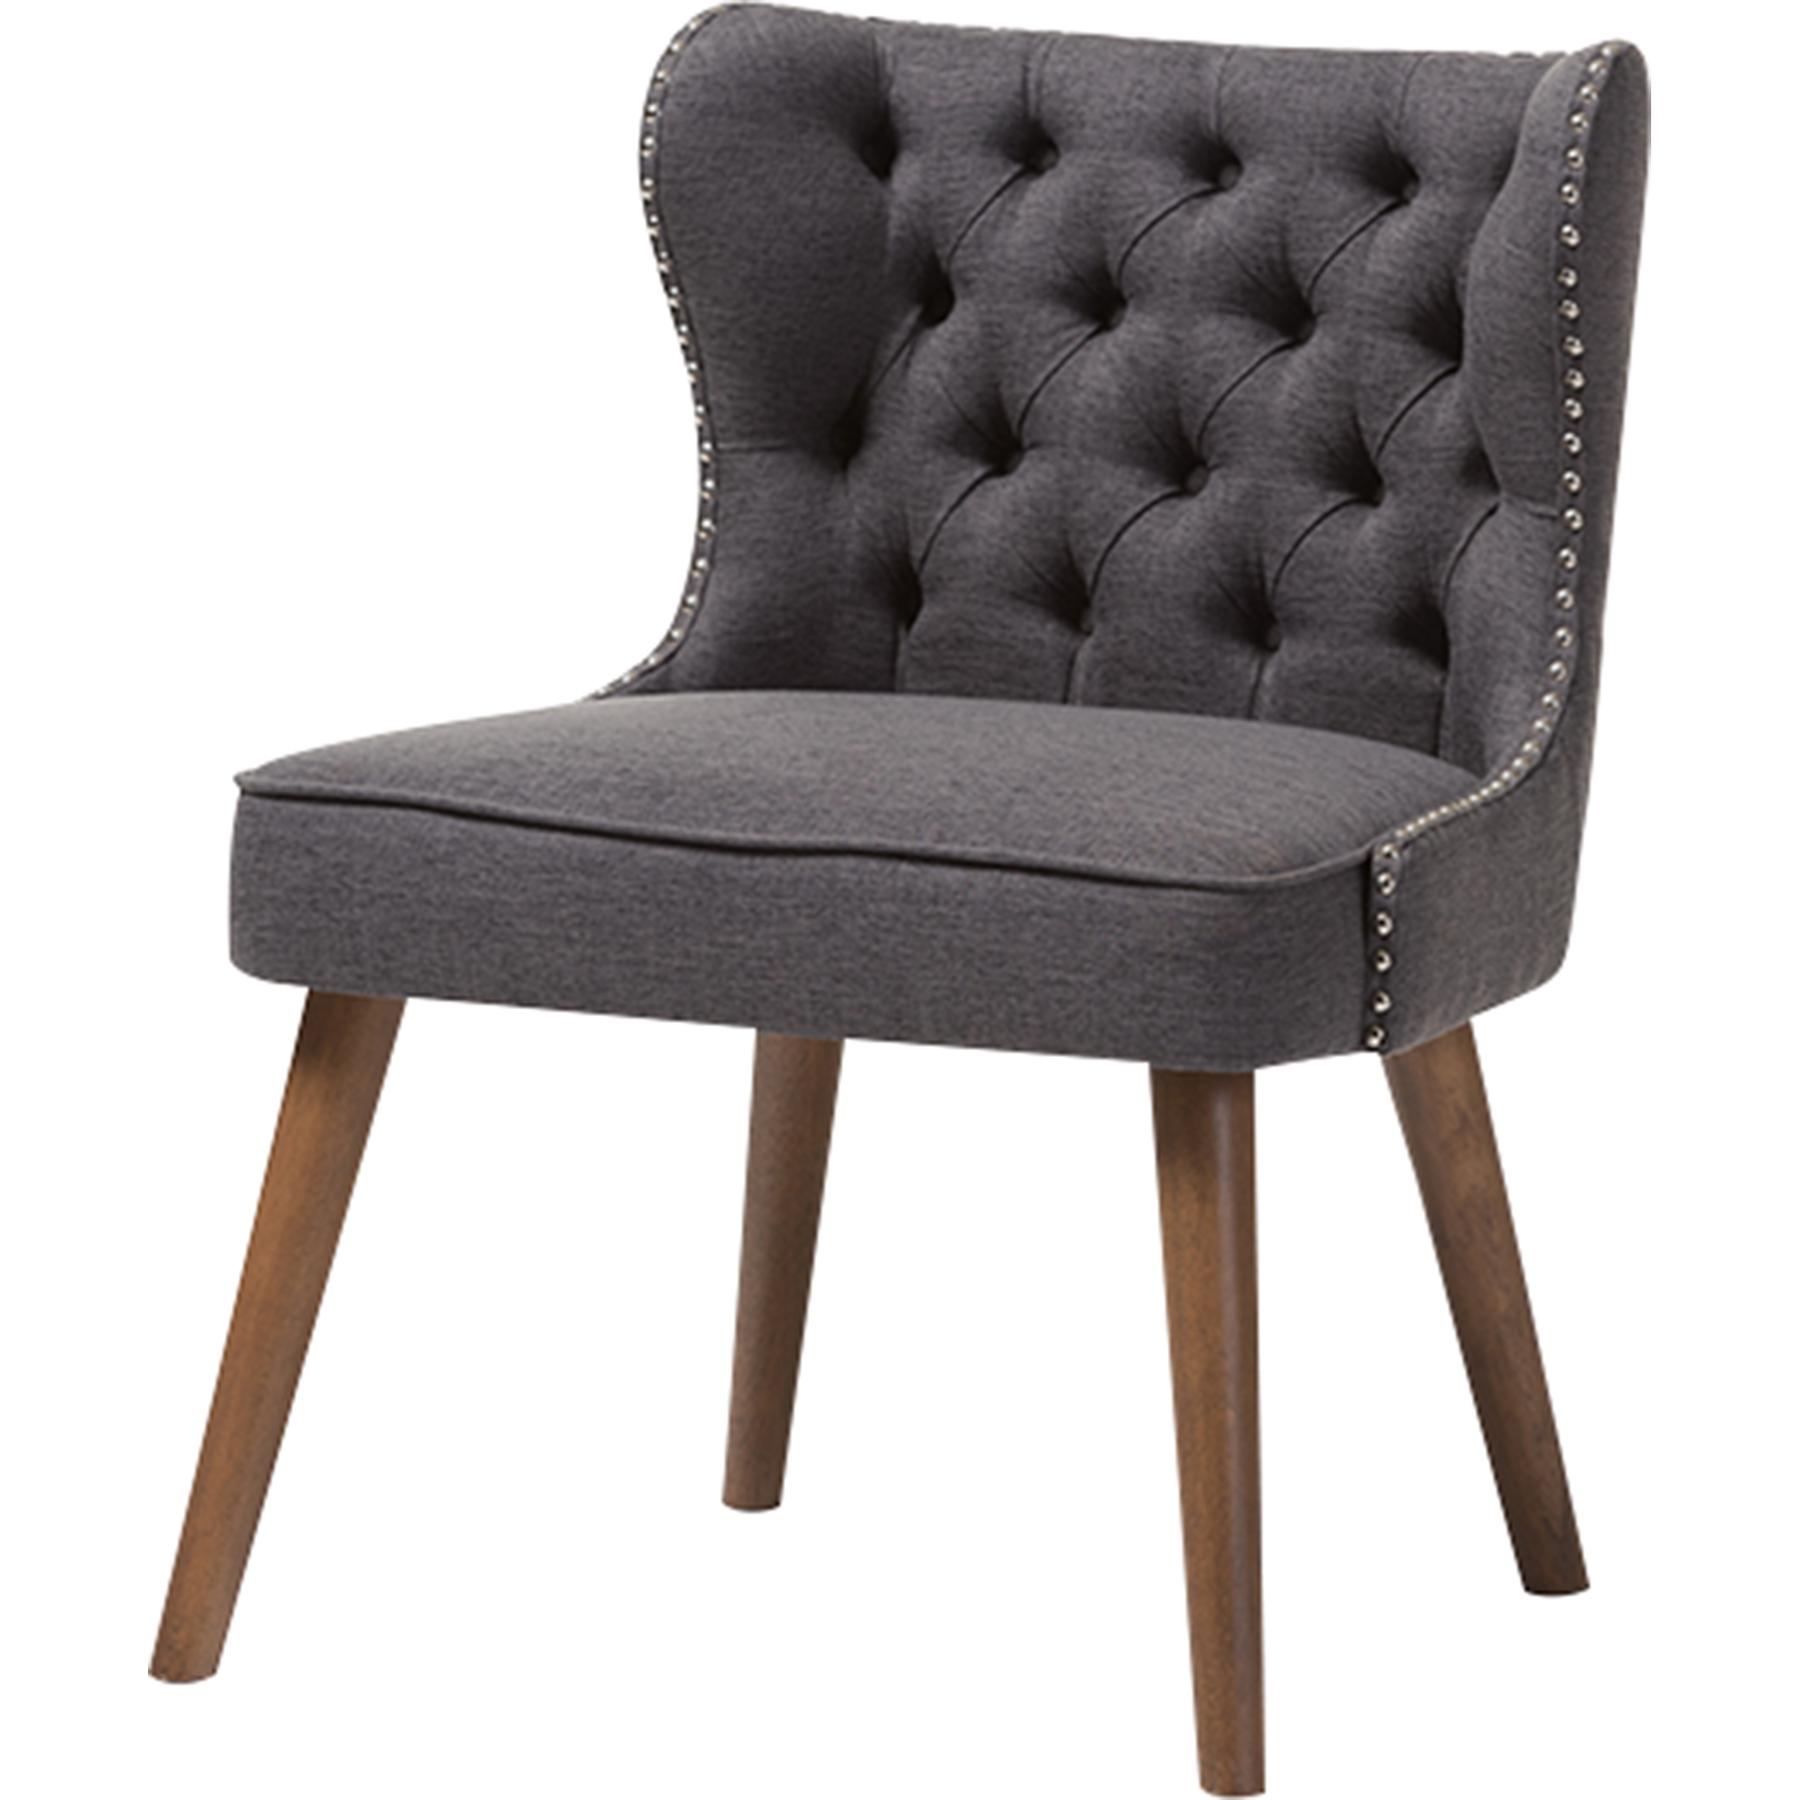 Bon Scarlett Upholstered Nailhead Accent Chair   Button Tufted, Dark Gray    WI BBT8017  ...